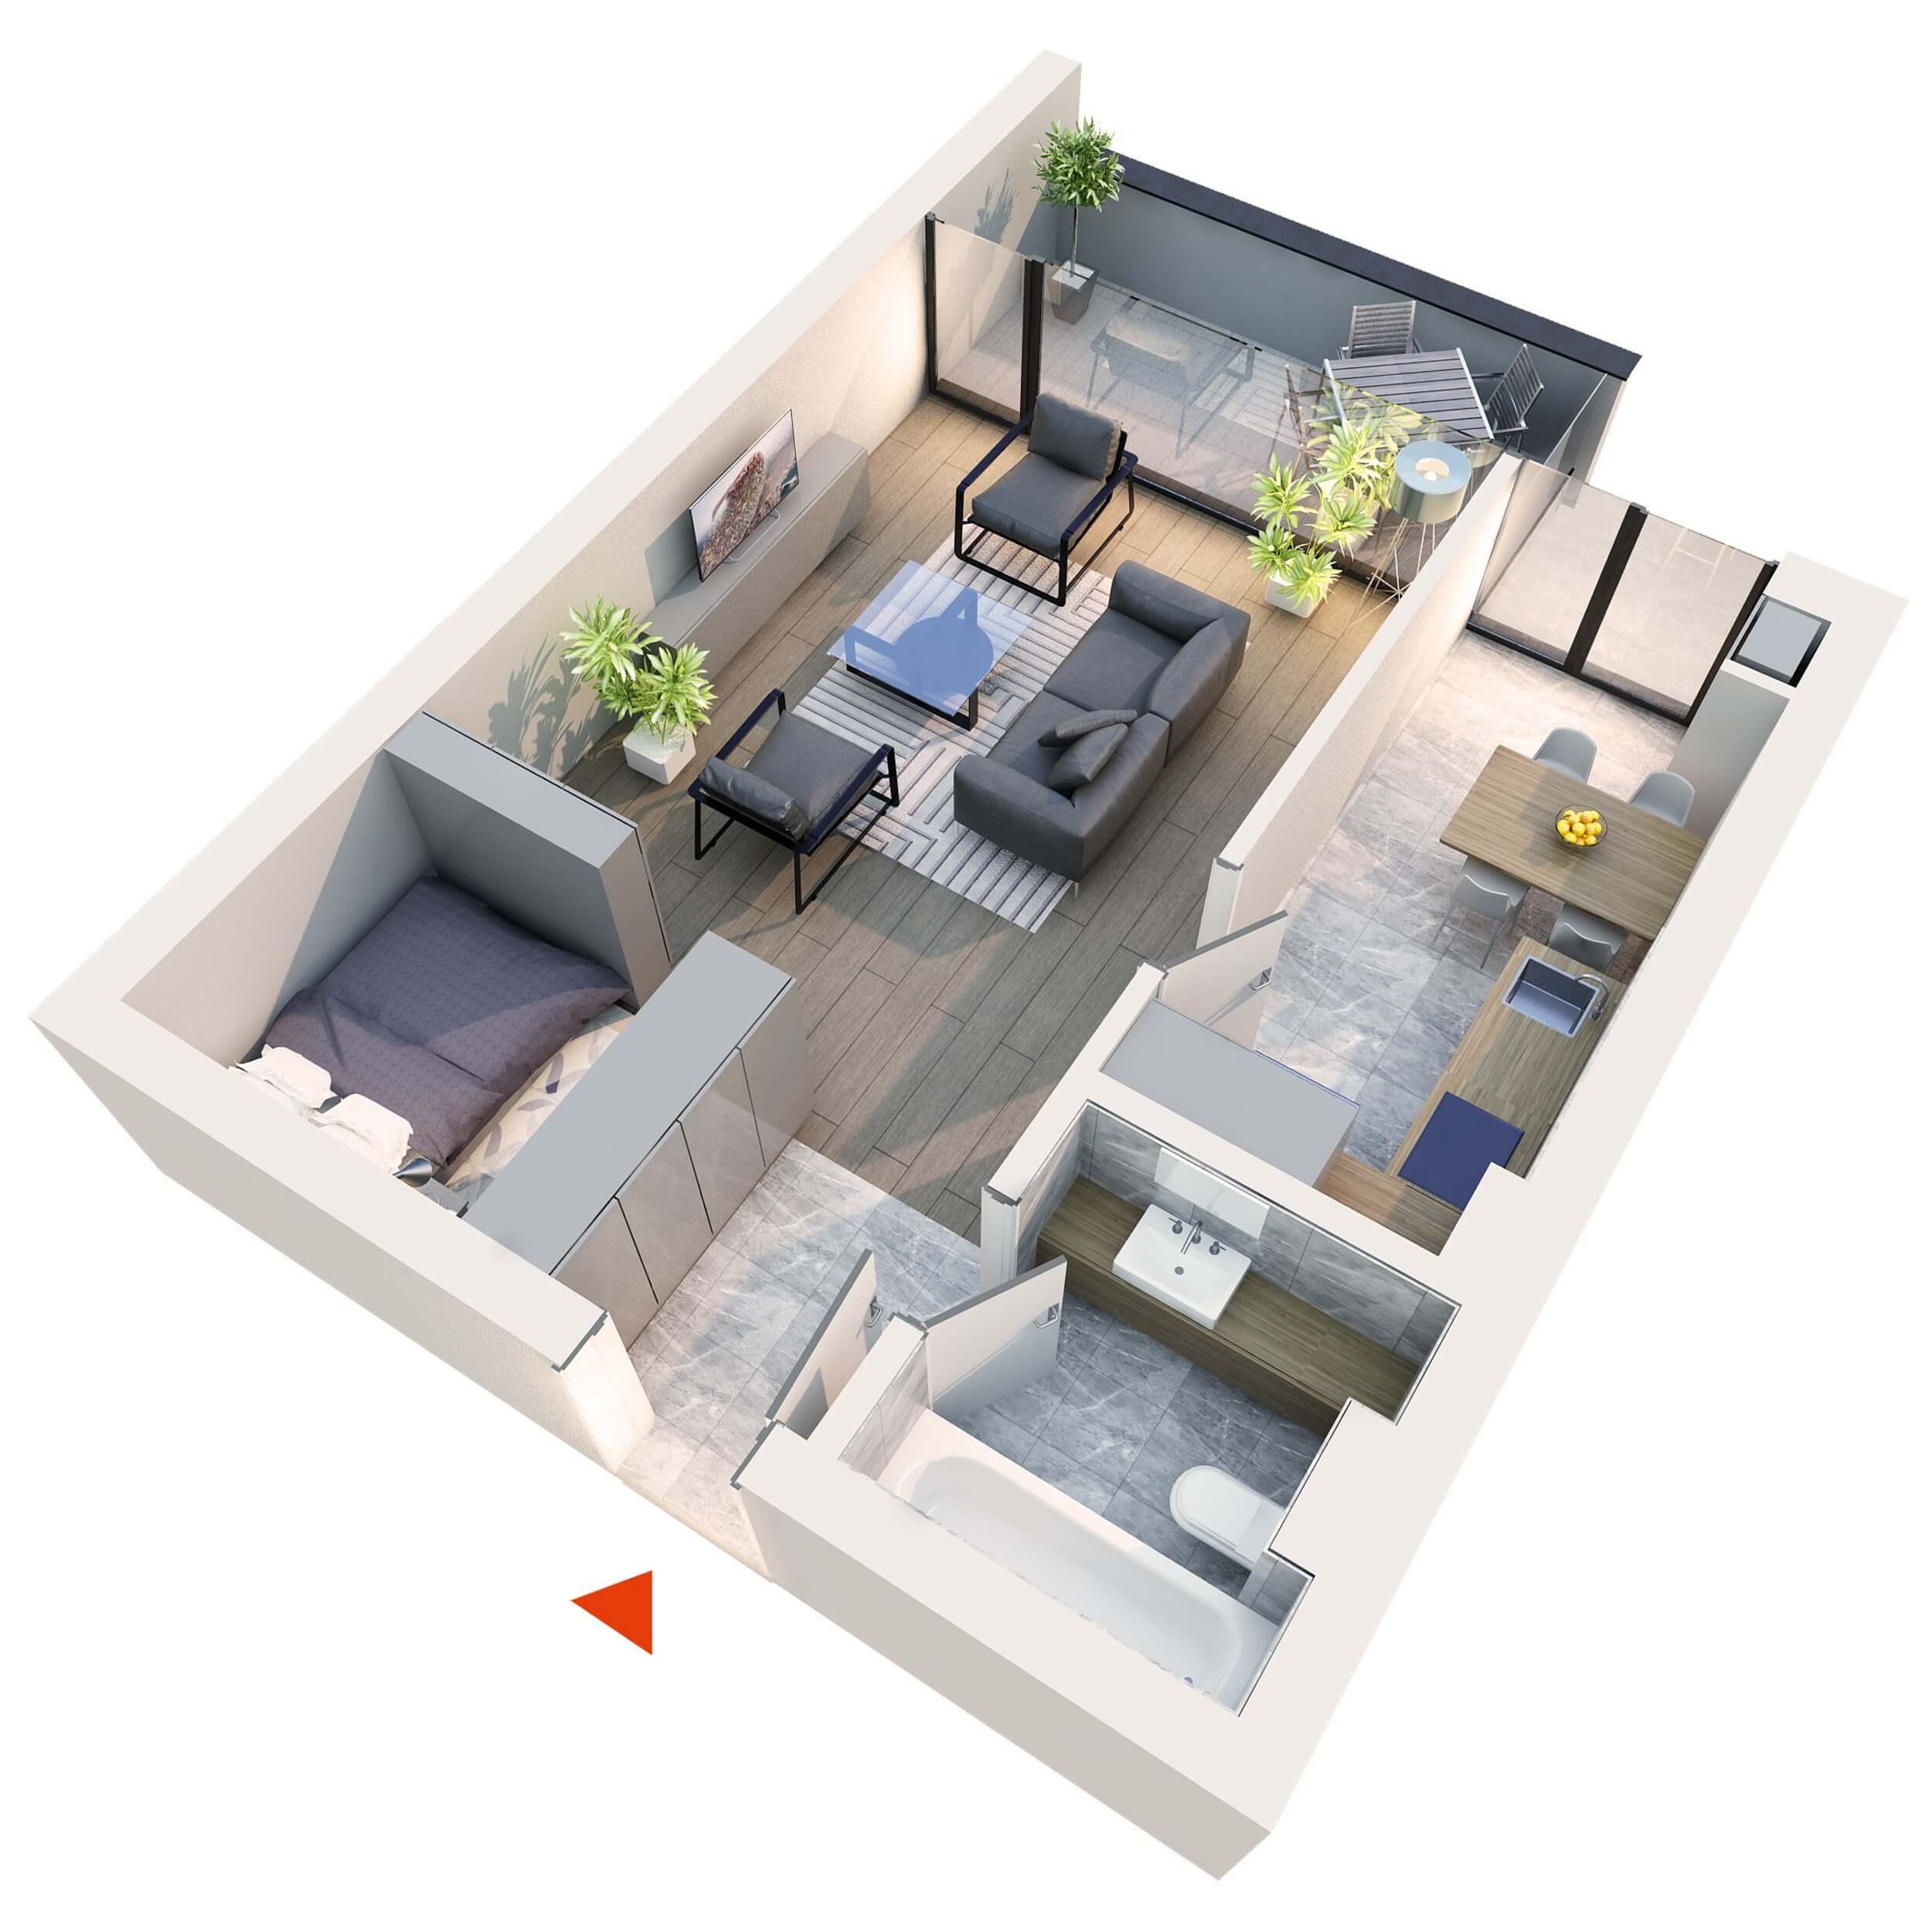 Apartament Studio tip 1D1′ | Balcon | Etaj 1 – 4 | Corp C7 | Faza 2